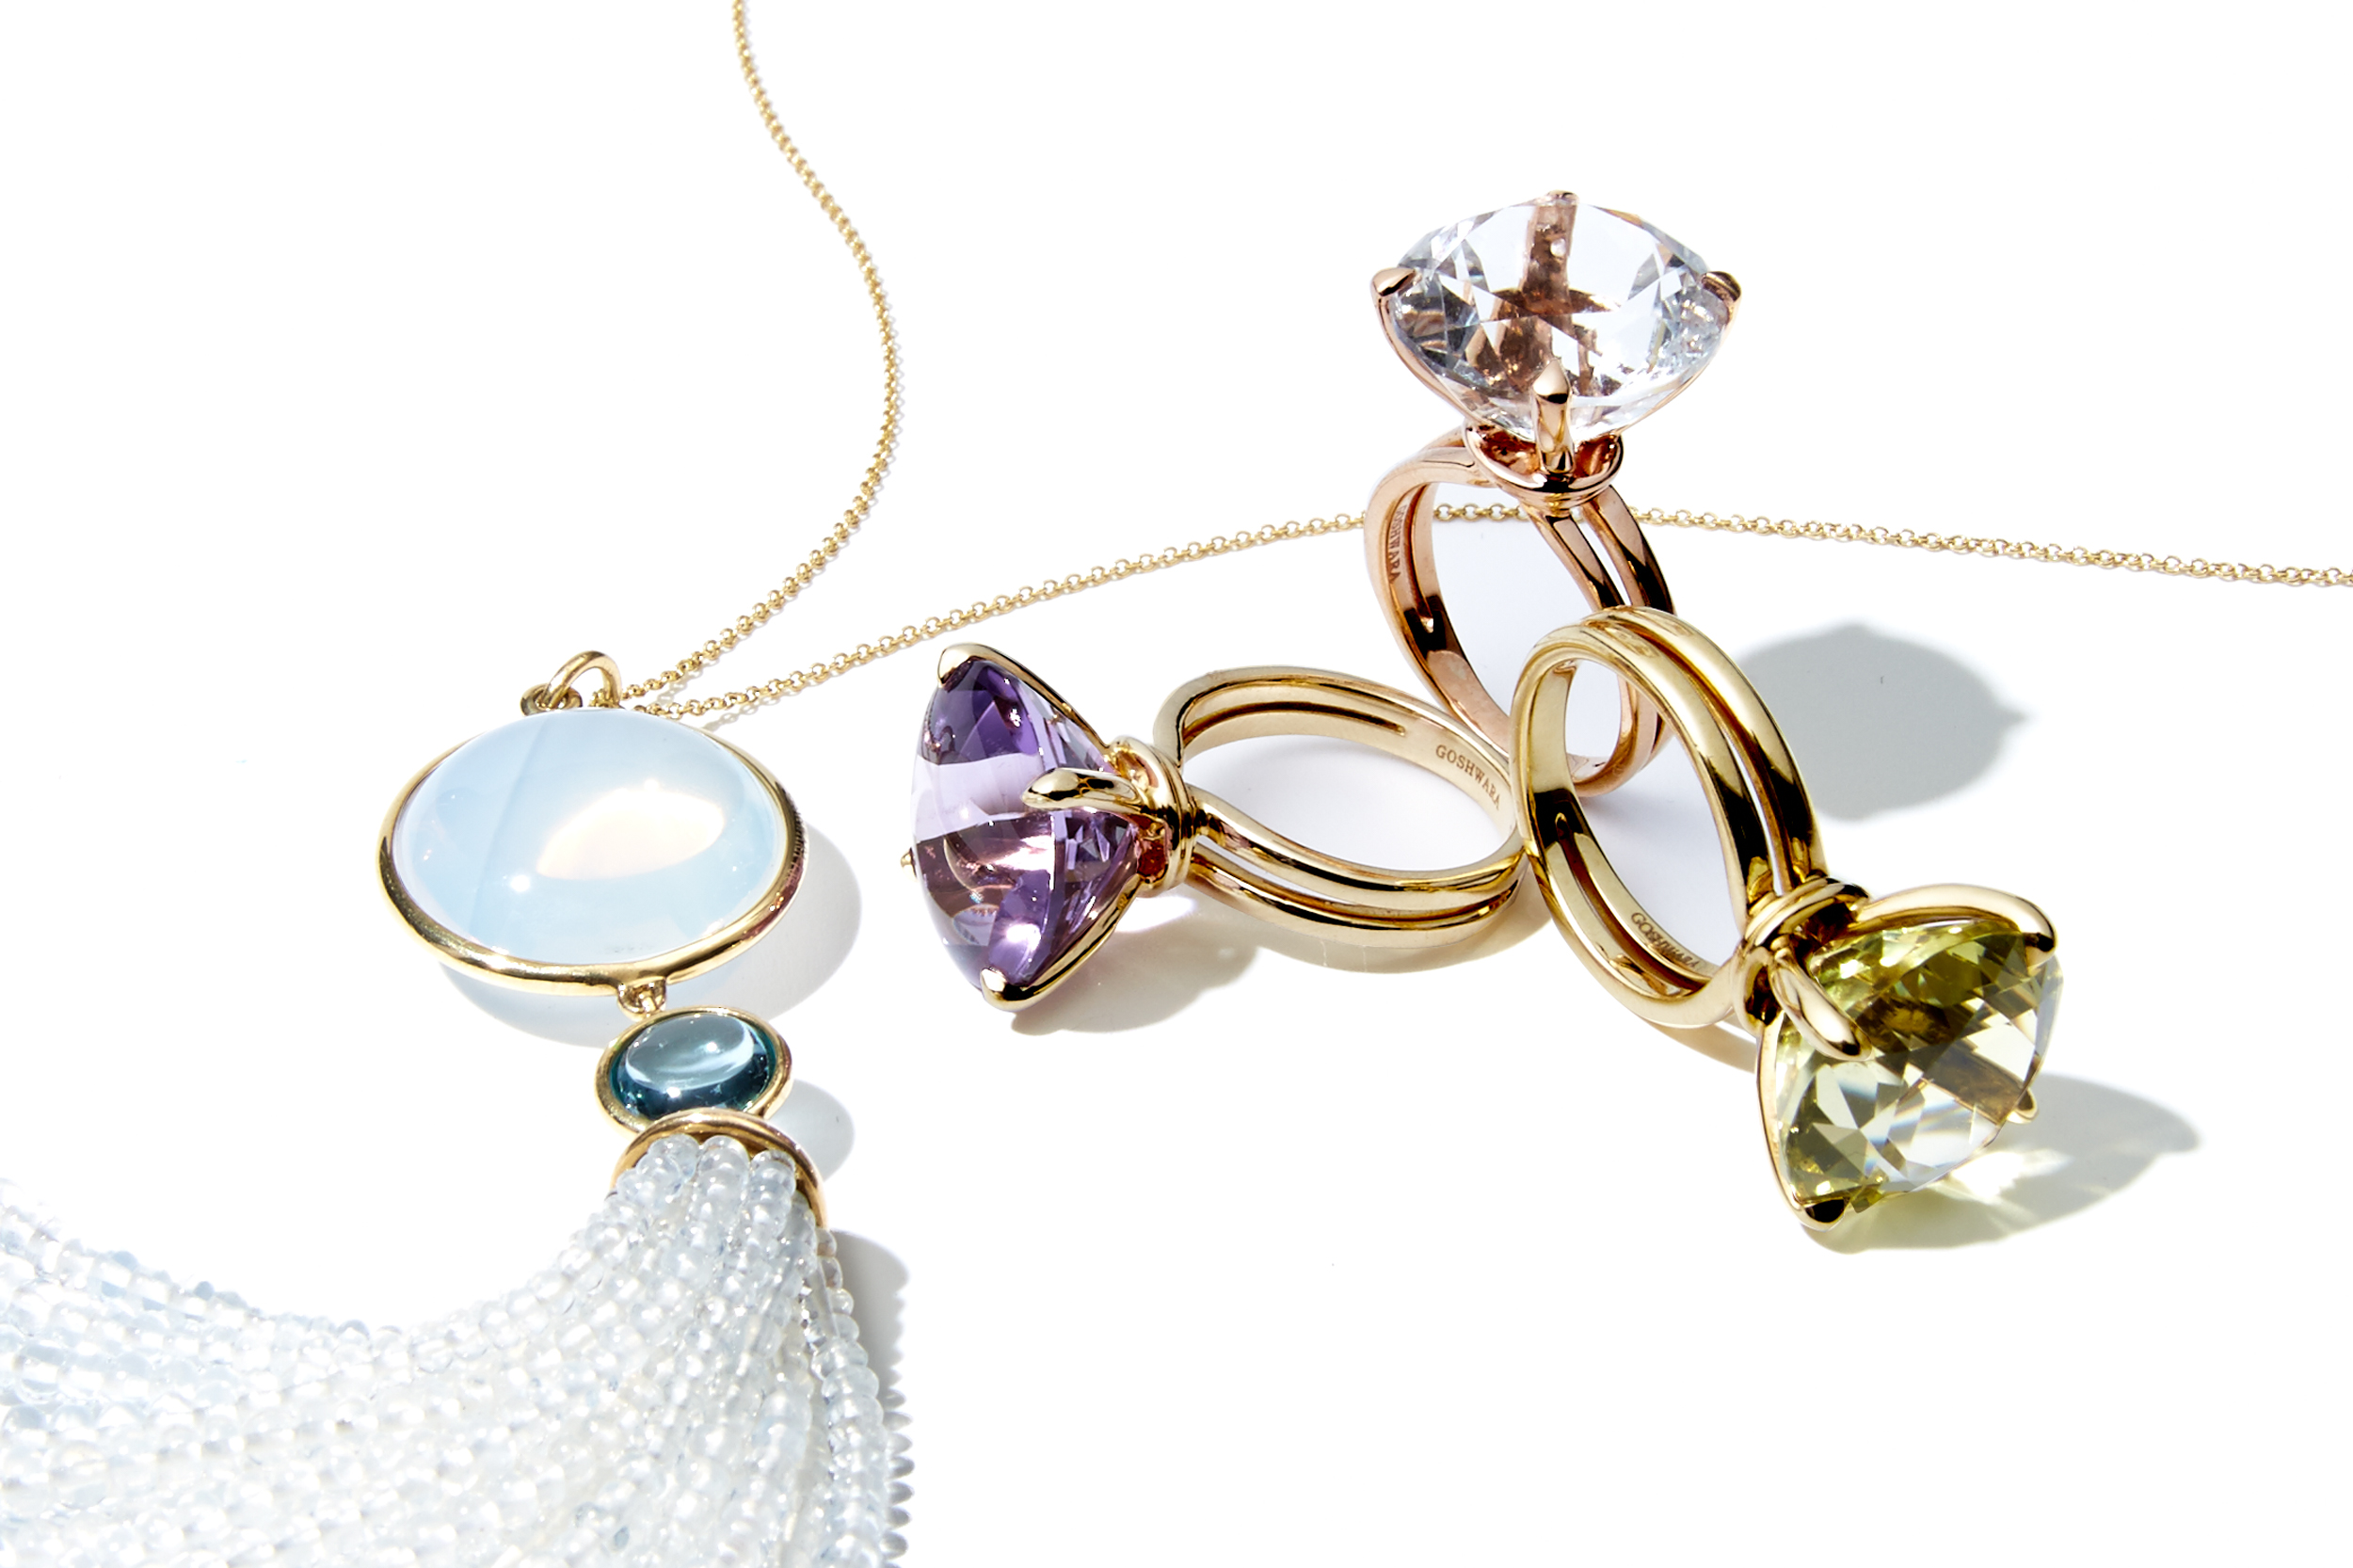 Gemstones_Goshwara_Fine_Jewelry_1097944497_EDITORIAL_177BASE.jpg